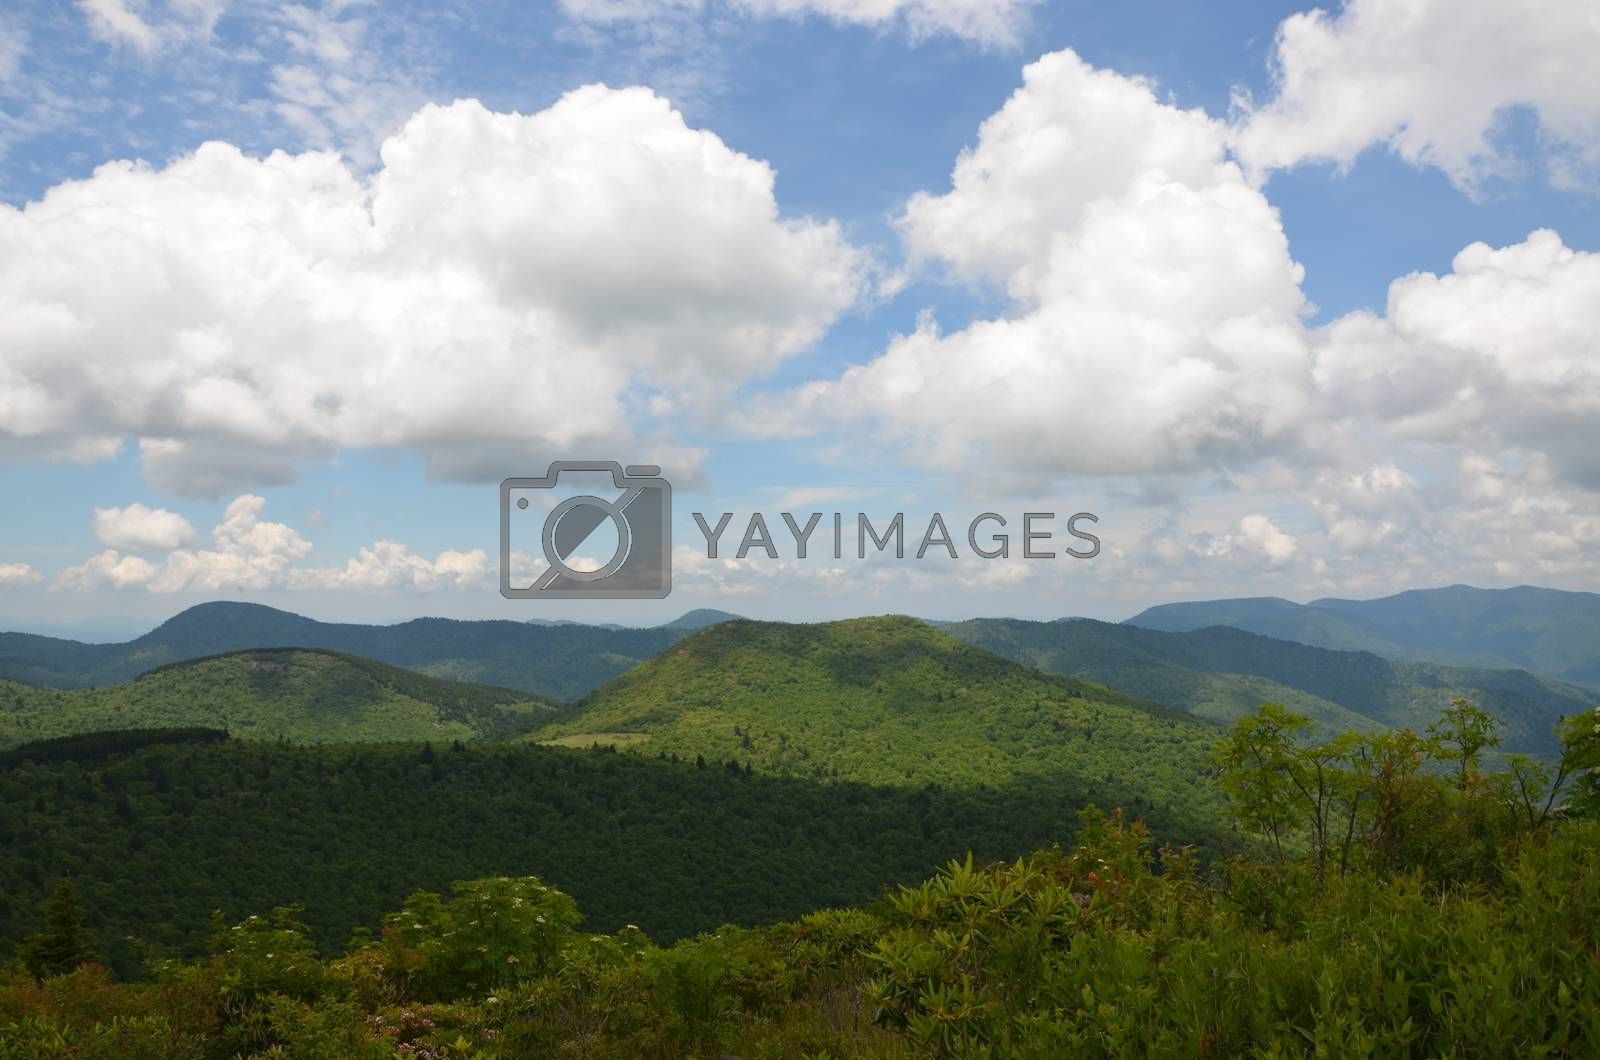 View along the Art Loeb trail in North Carolina. This is near Black Balsam knob.